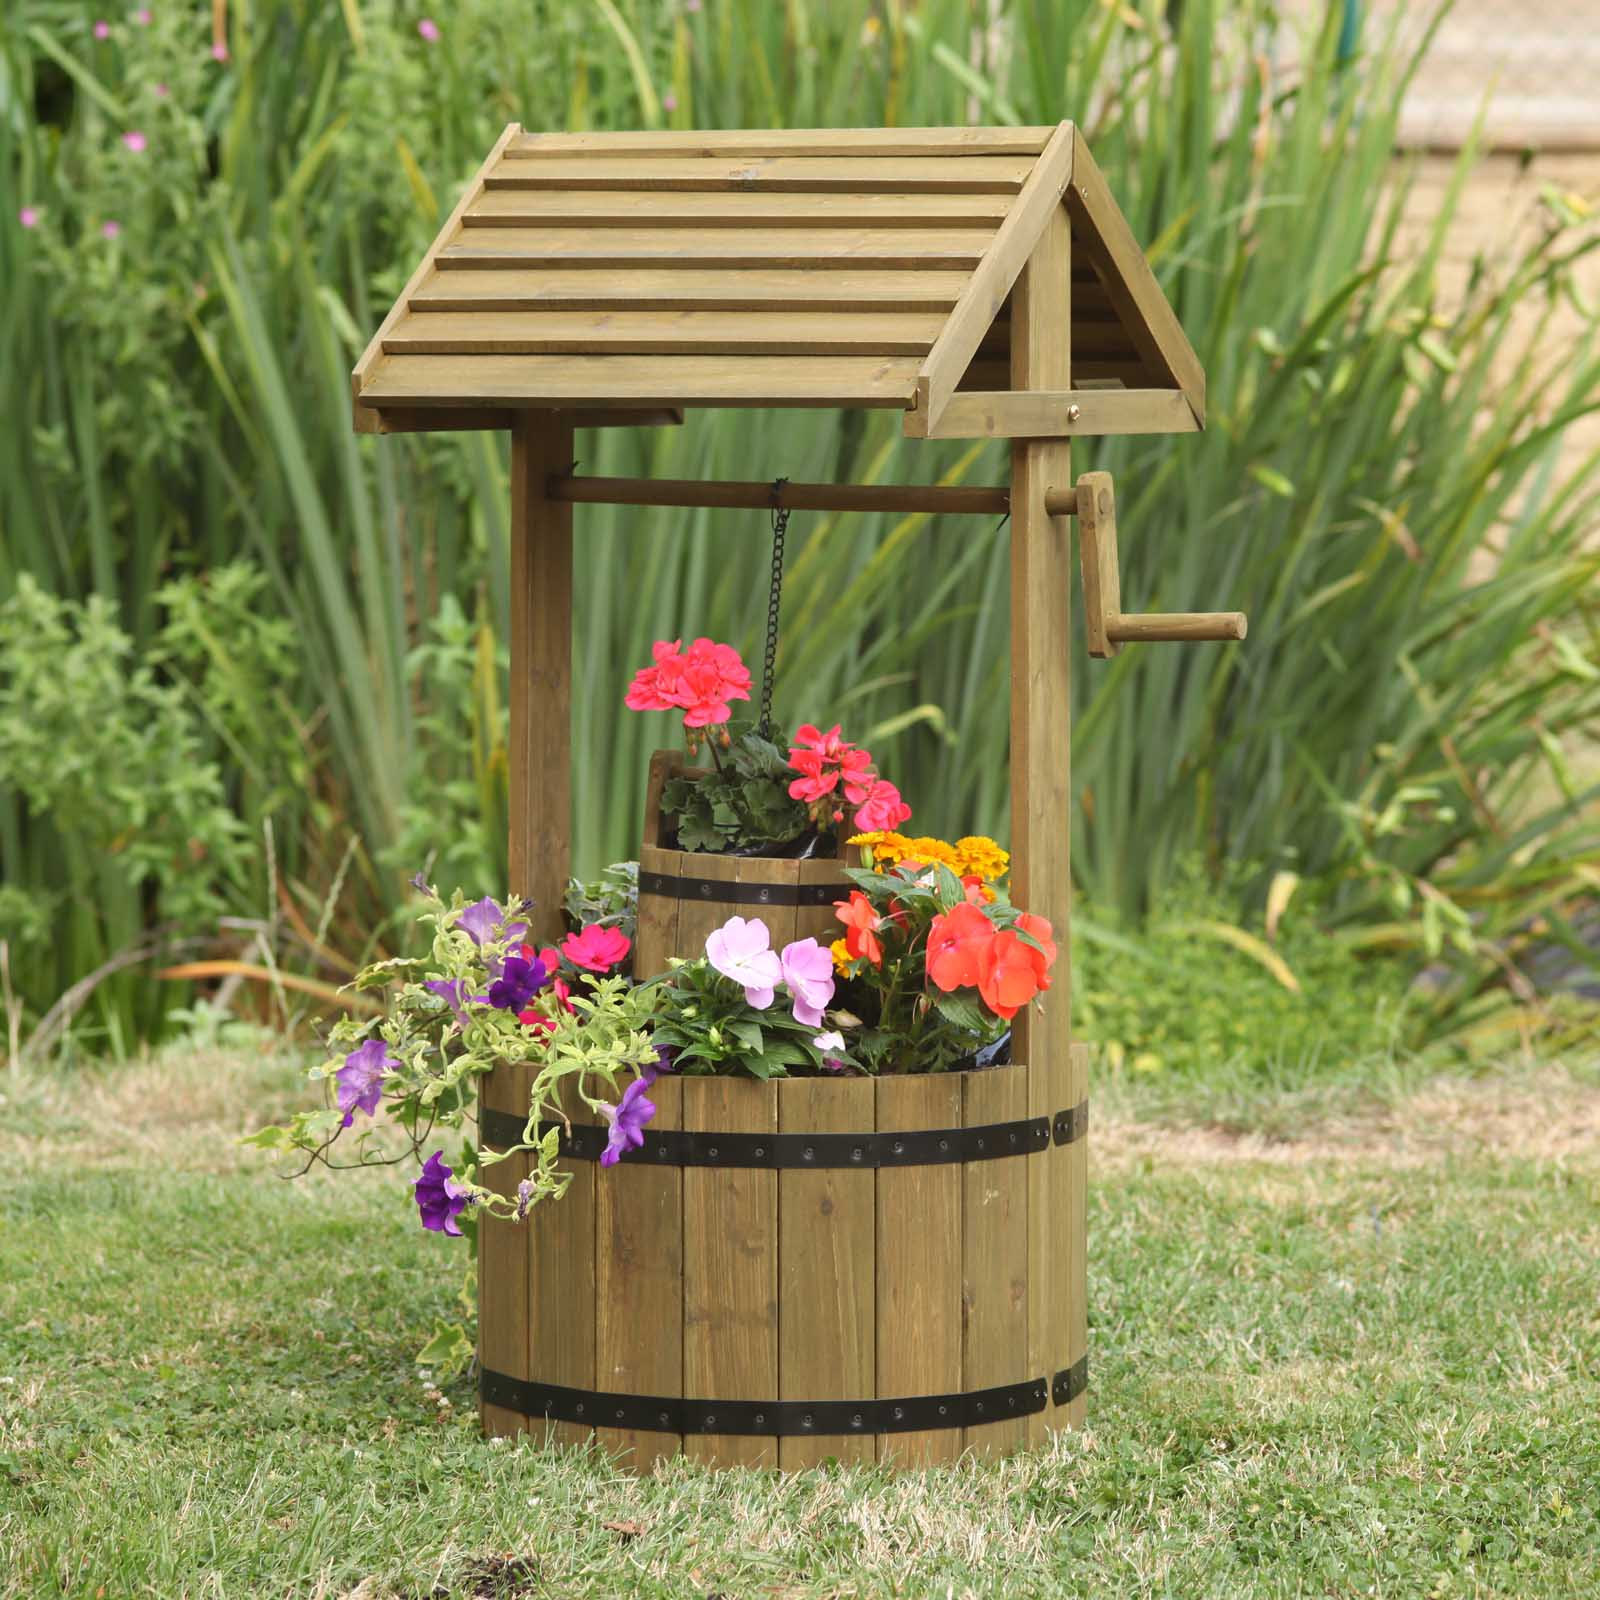 Woodland Wishing Well Planter by Smart Garden ⋆ Garden Universal